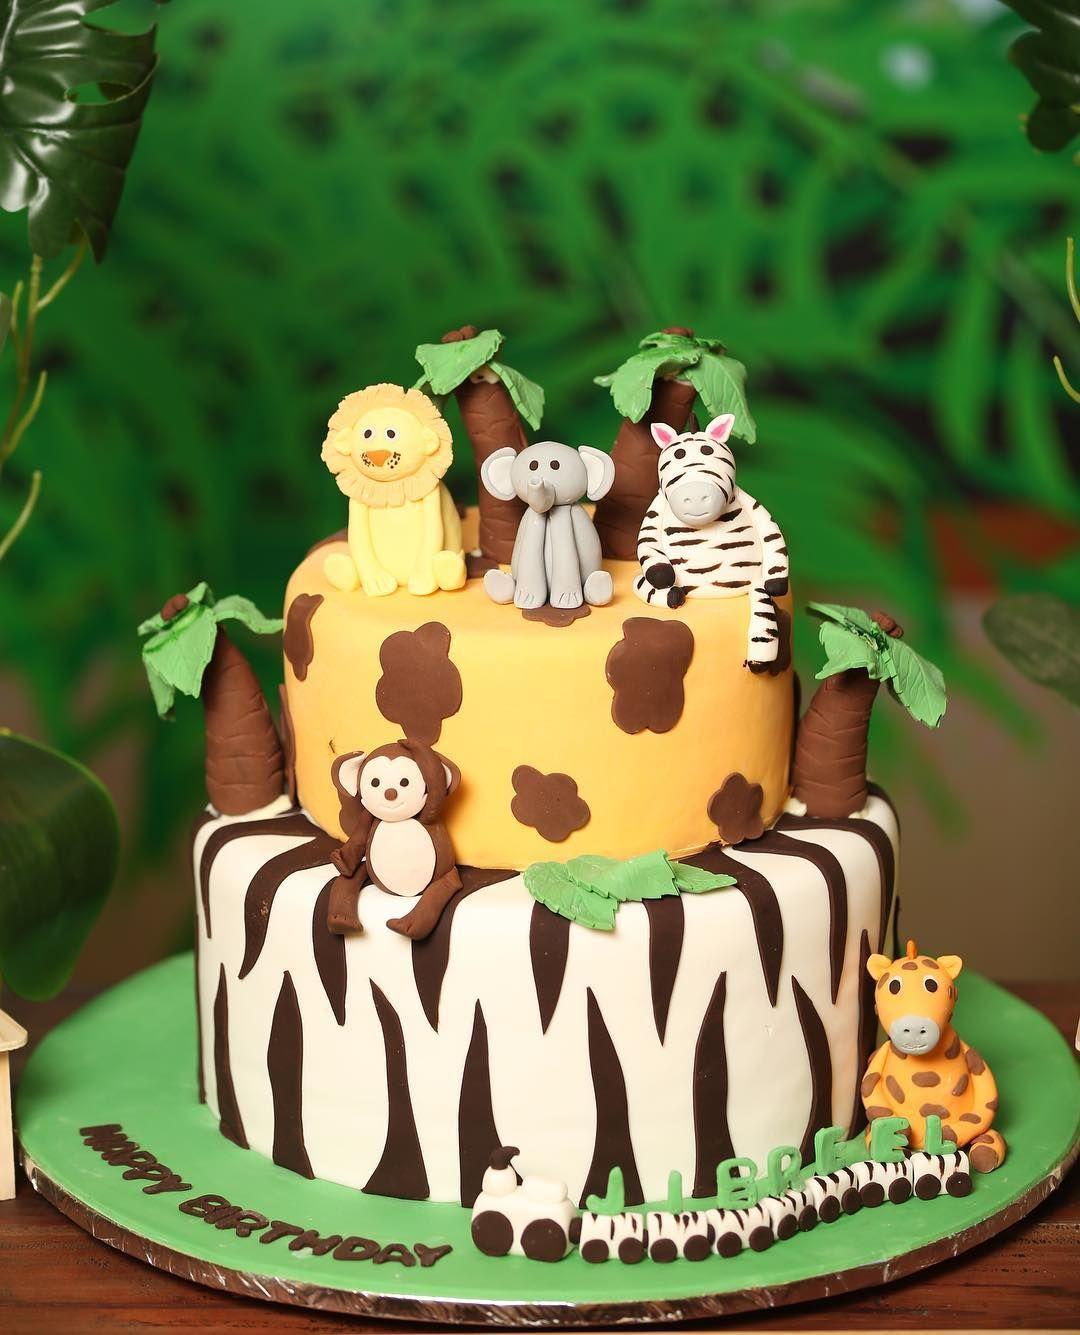 Admirable Jungle Safari Birthday Cake Safari Birthday Cakes Safari Cakes Funny Birthday Cards Online Elaedamsfinfo